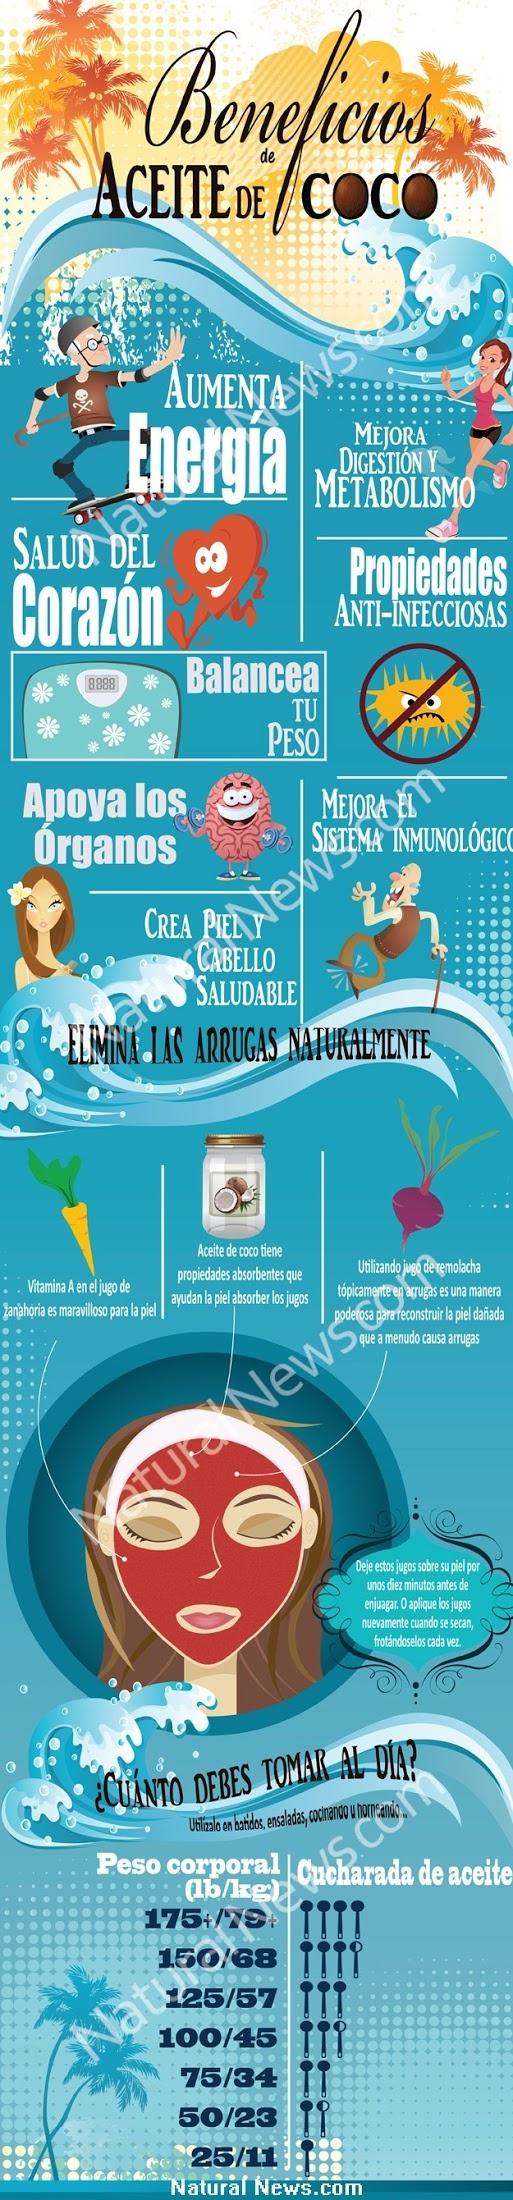 Beneficios del aceite de coco. http://www.pinterest.com/pin/387942955374031633/